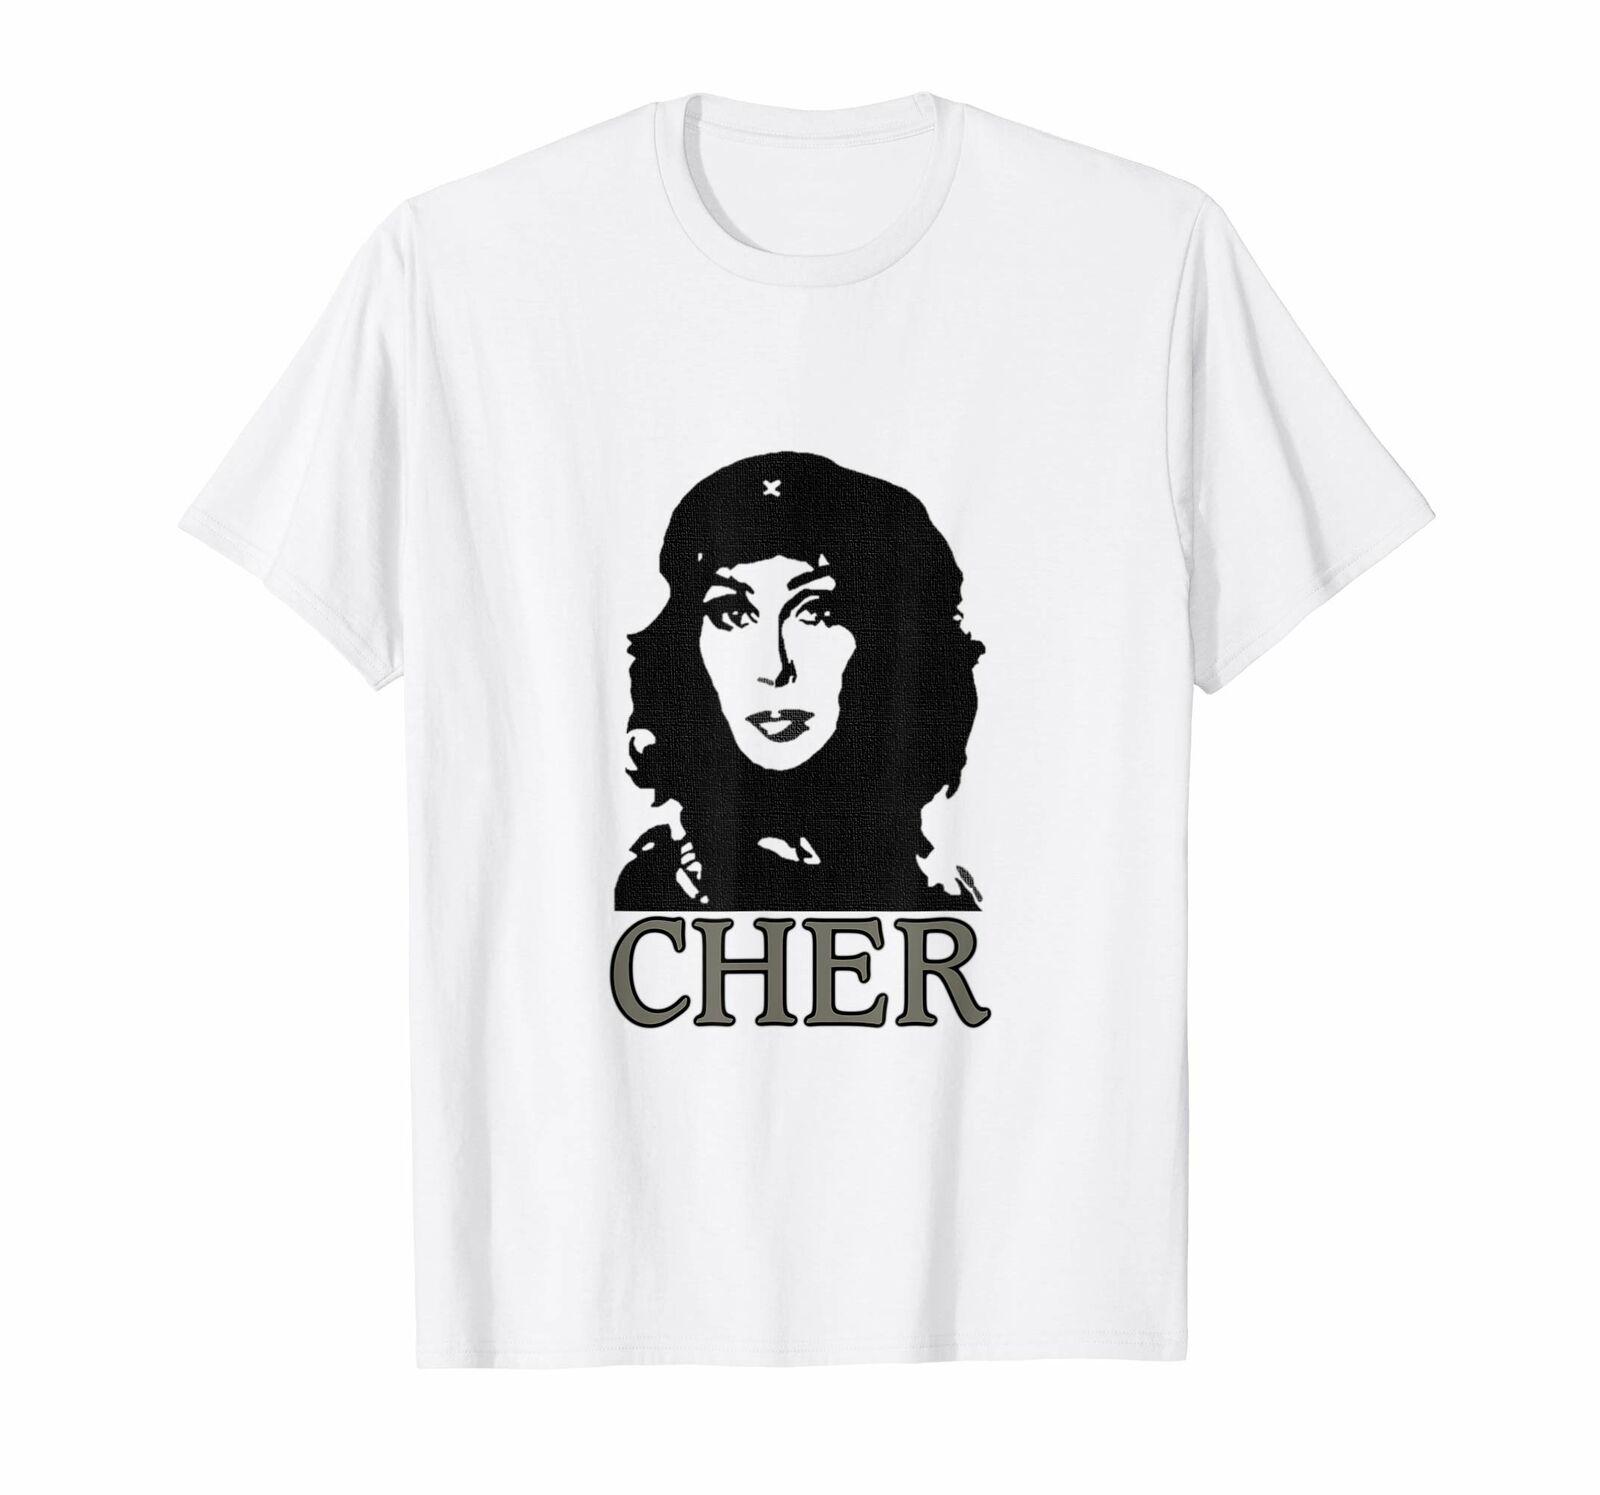 Cher Deusa Da Pop Acreditar Feminista de Che Guevara T-Shirt Branca S-3XL